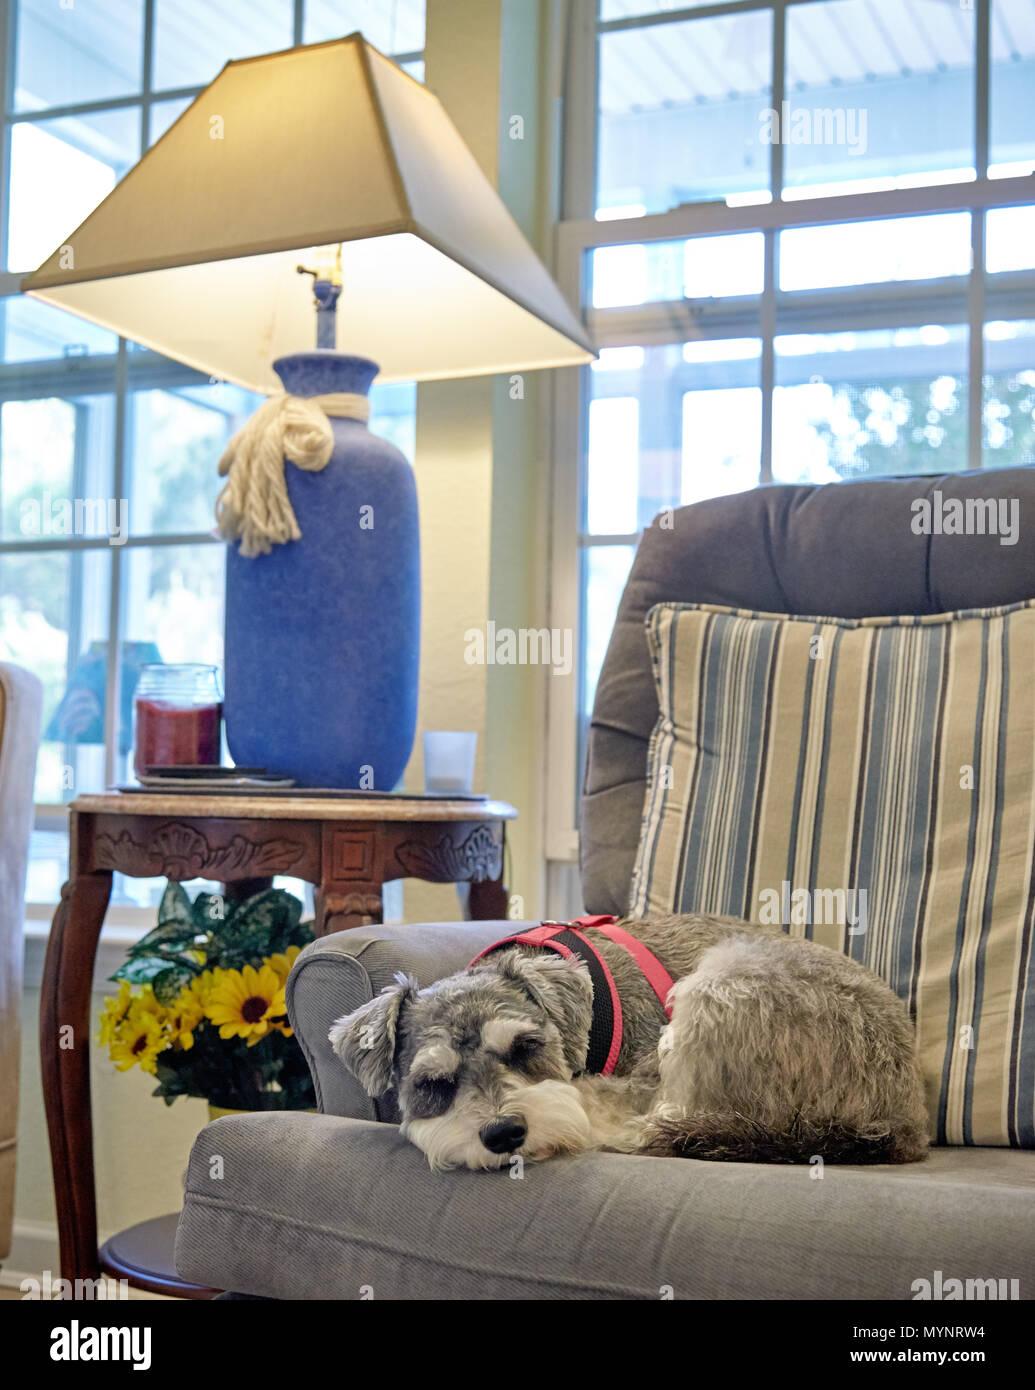 Dog sleeping on chair - Stock Image